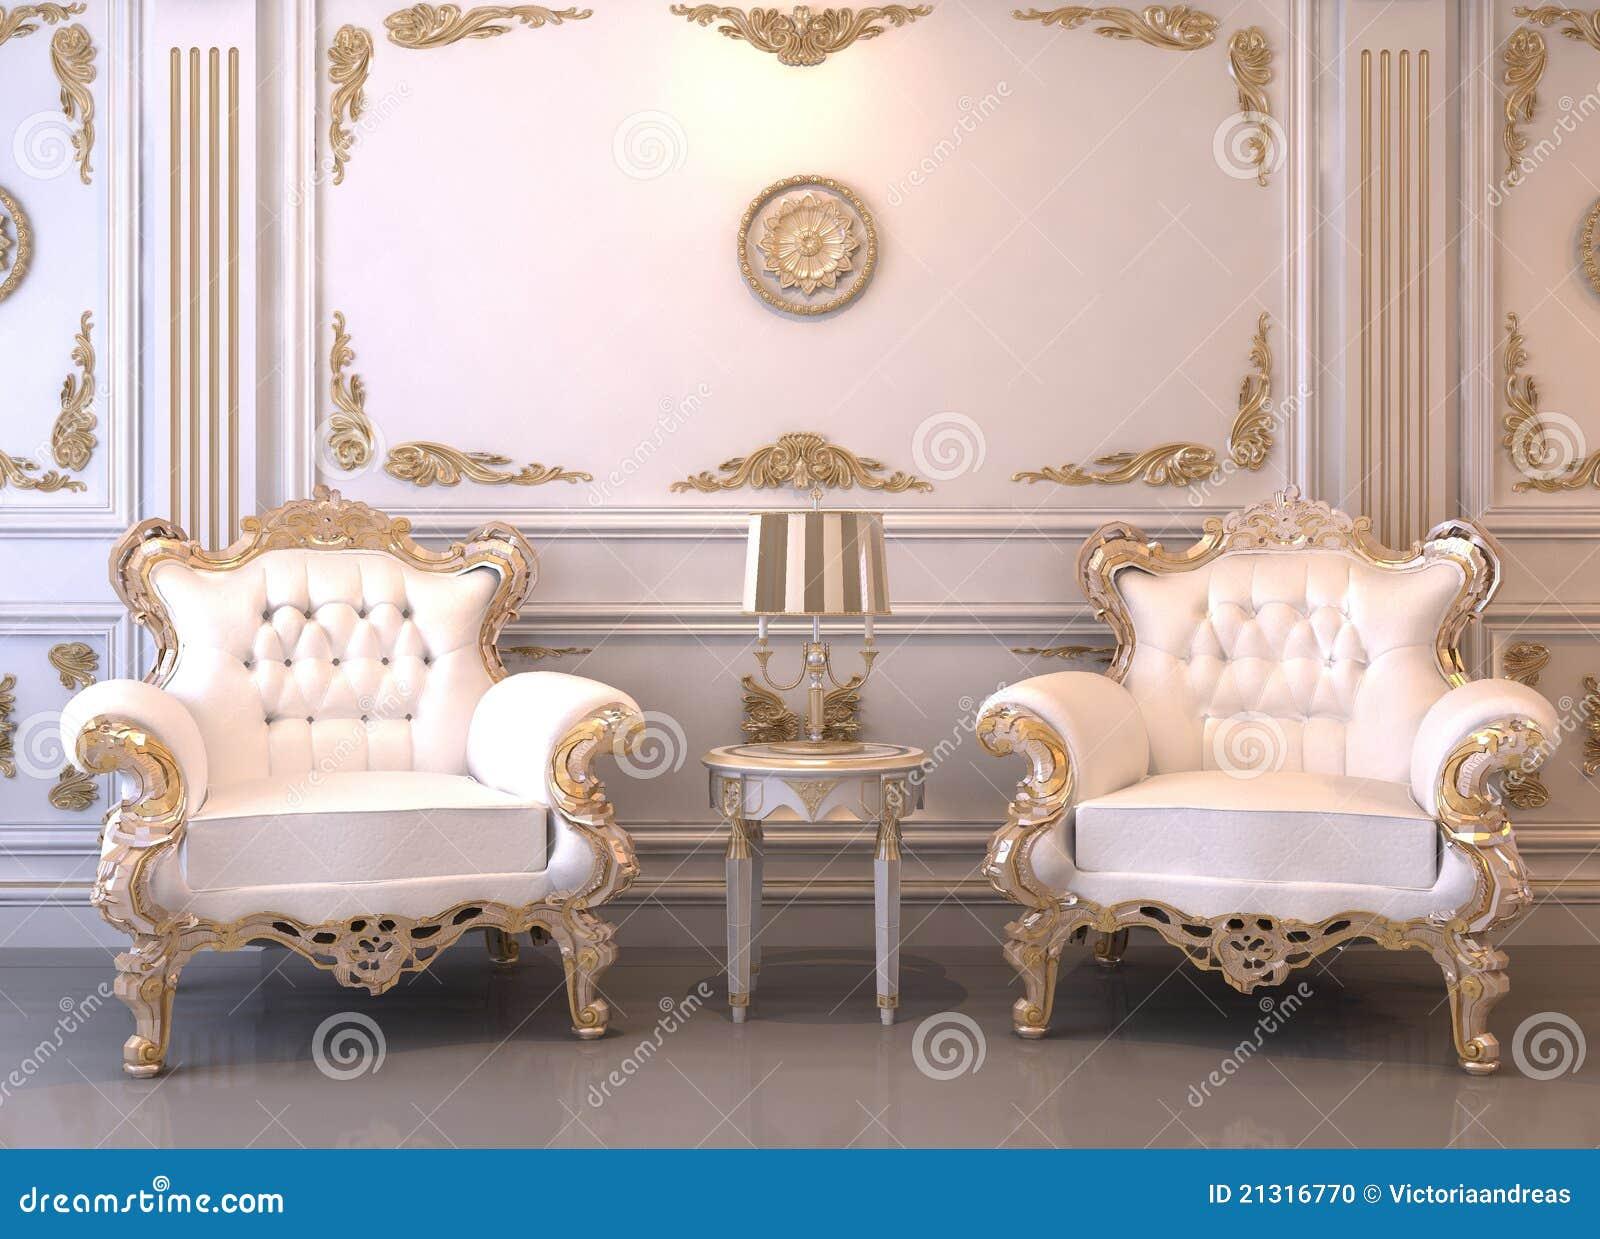 Royal Furniture In Luxury Interior Stock Illustration Illustration